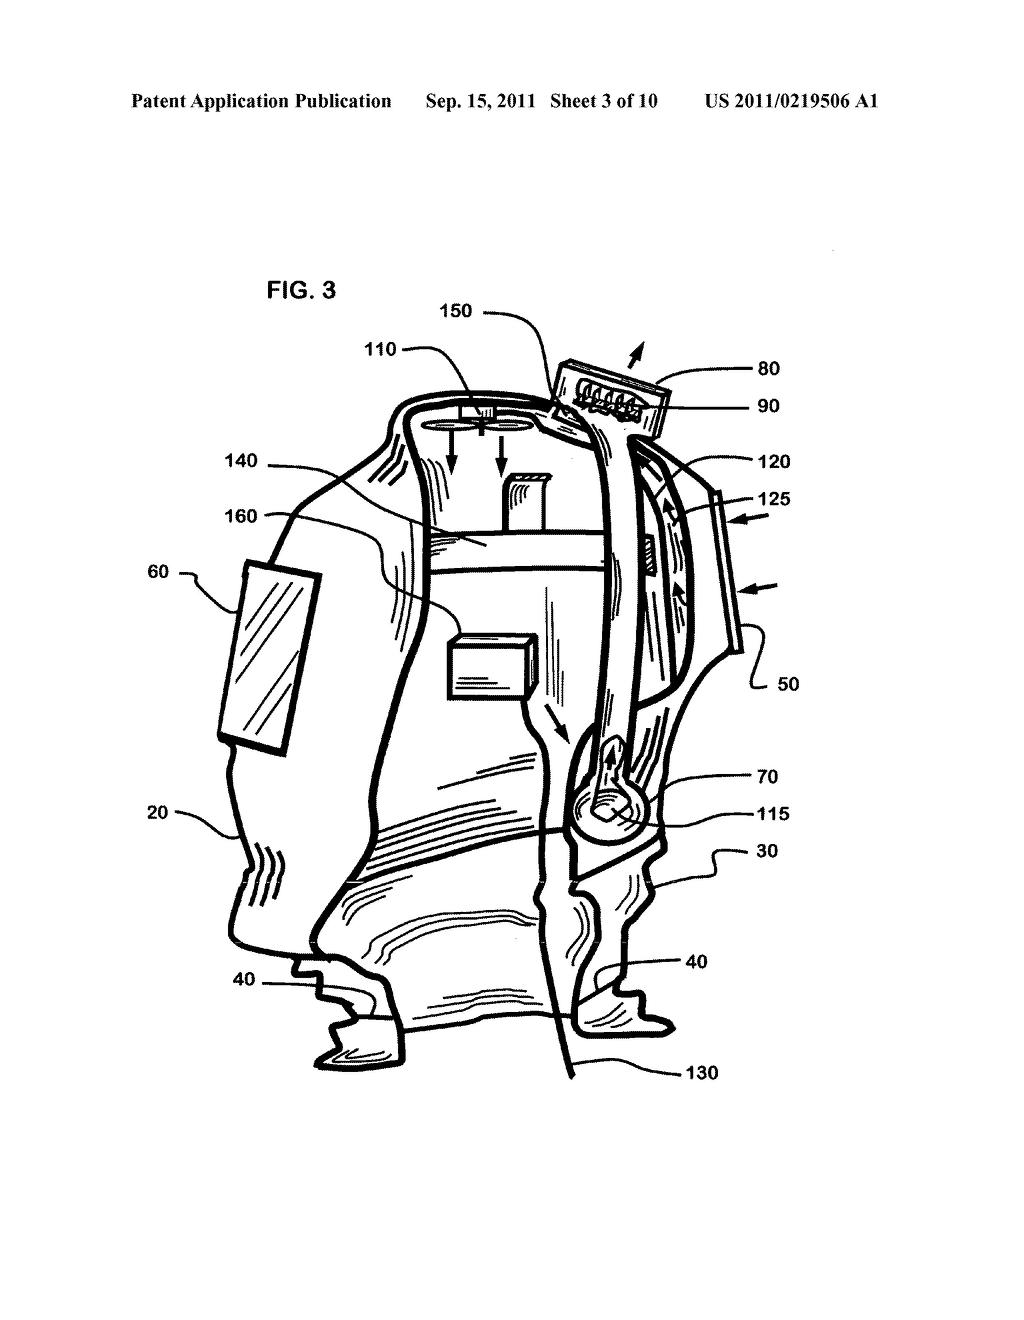 Cool clean air welding helmet diagram schematic and image 04 rh patentsencyclopedia cool welding helmets welding engineer diagram